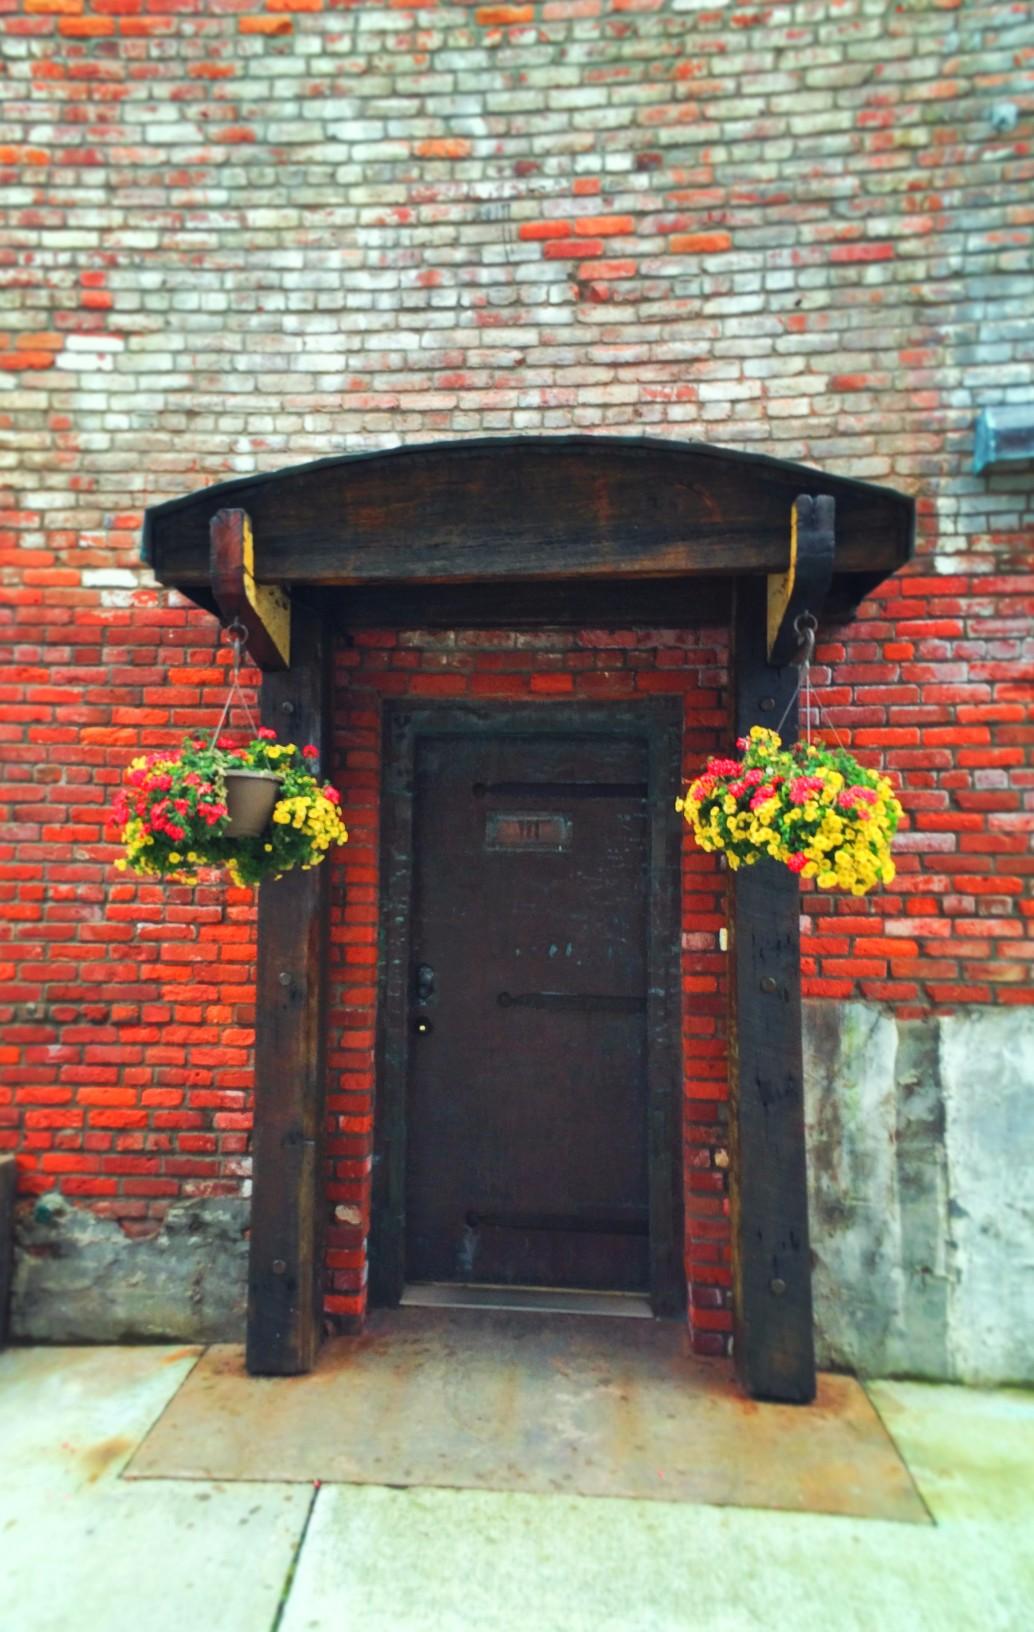 Victorian Seaport brick buildings Port Townsend 2